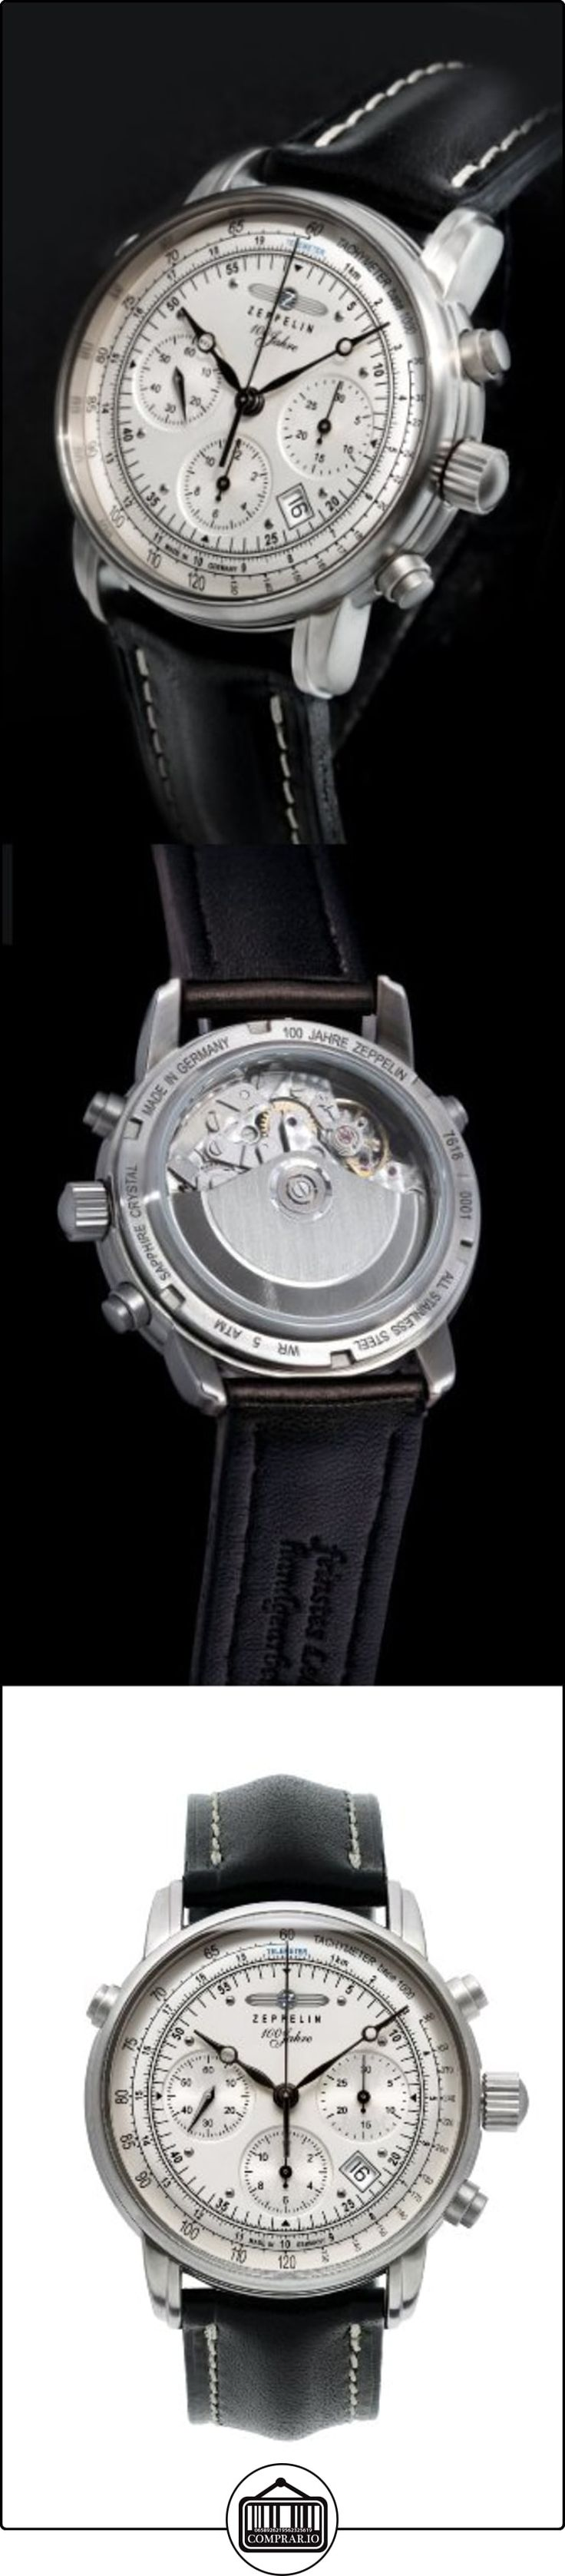 Zeppelin 7618-1 Reloj de caballero  ✿ Relojes para hombre - (Lujo) ✿